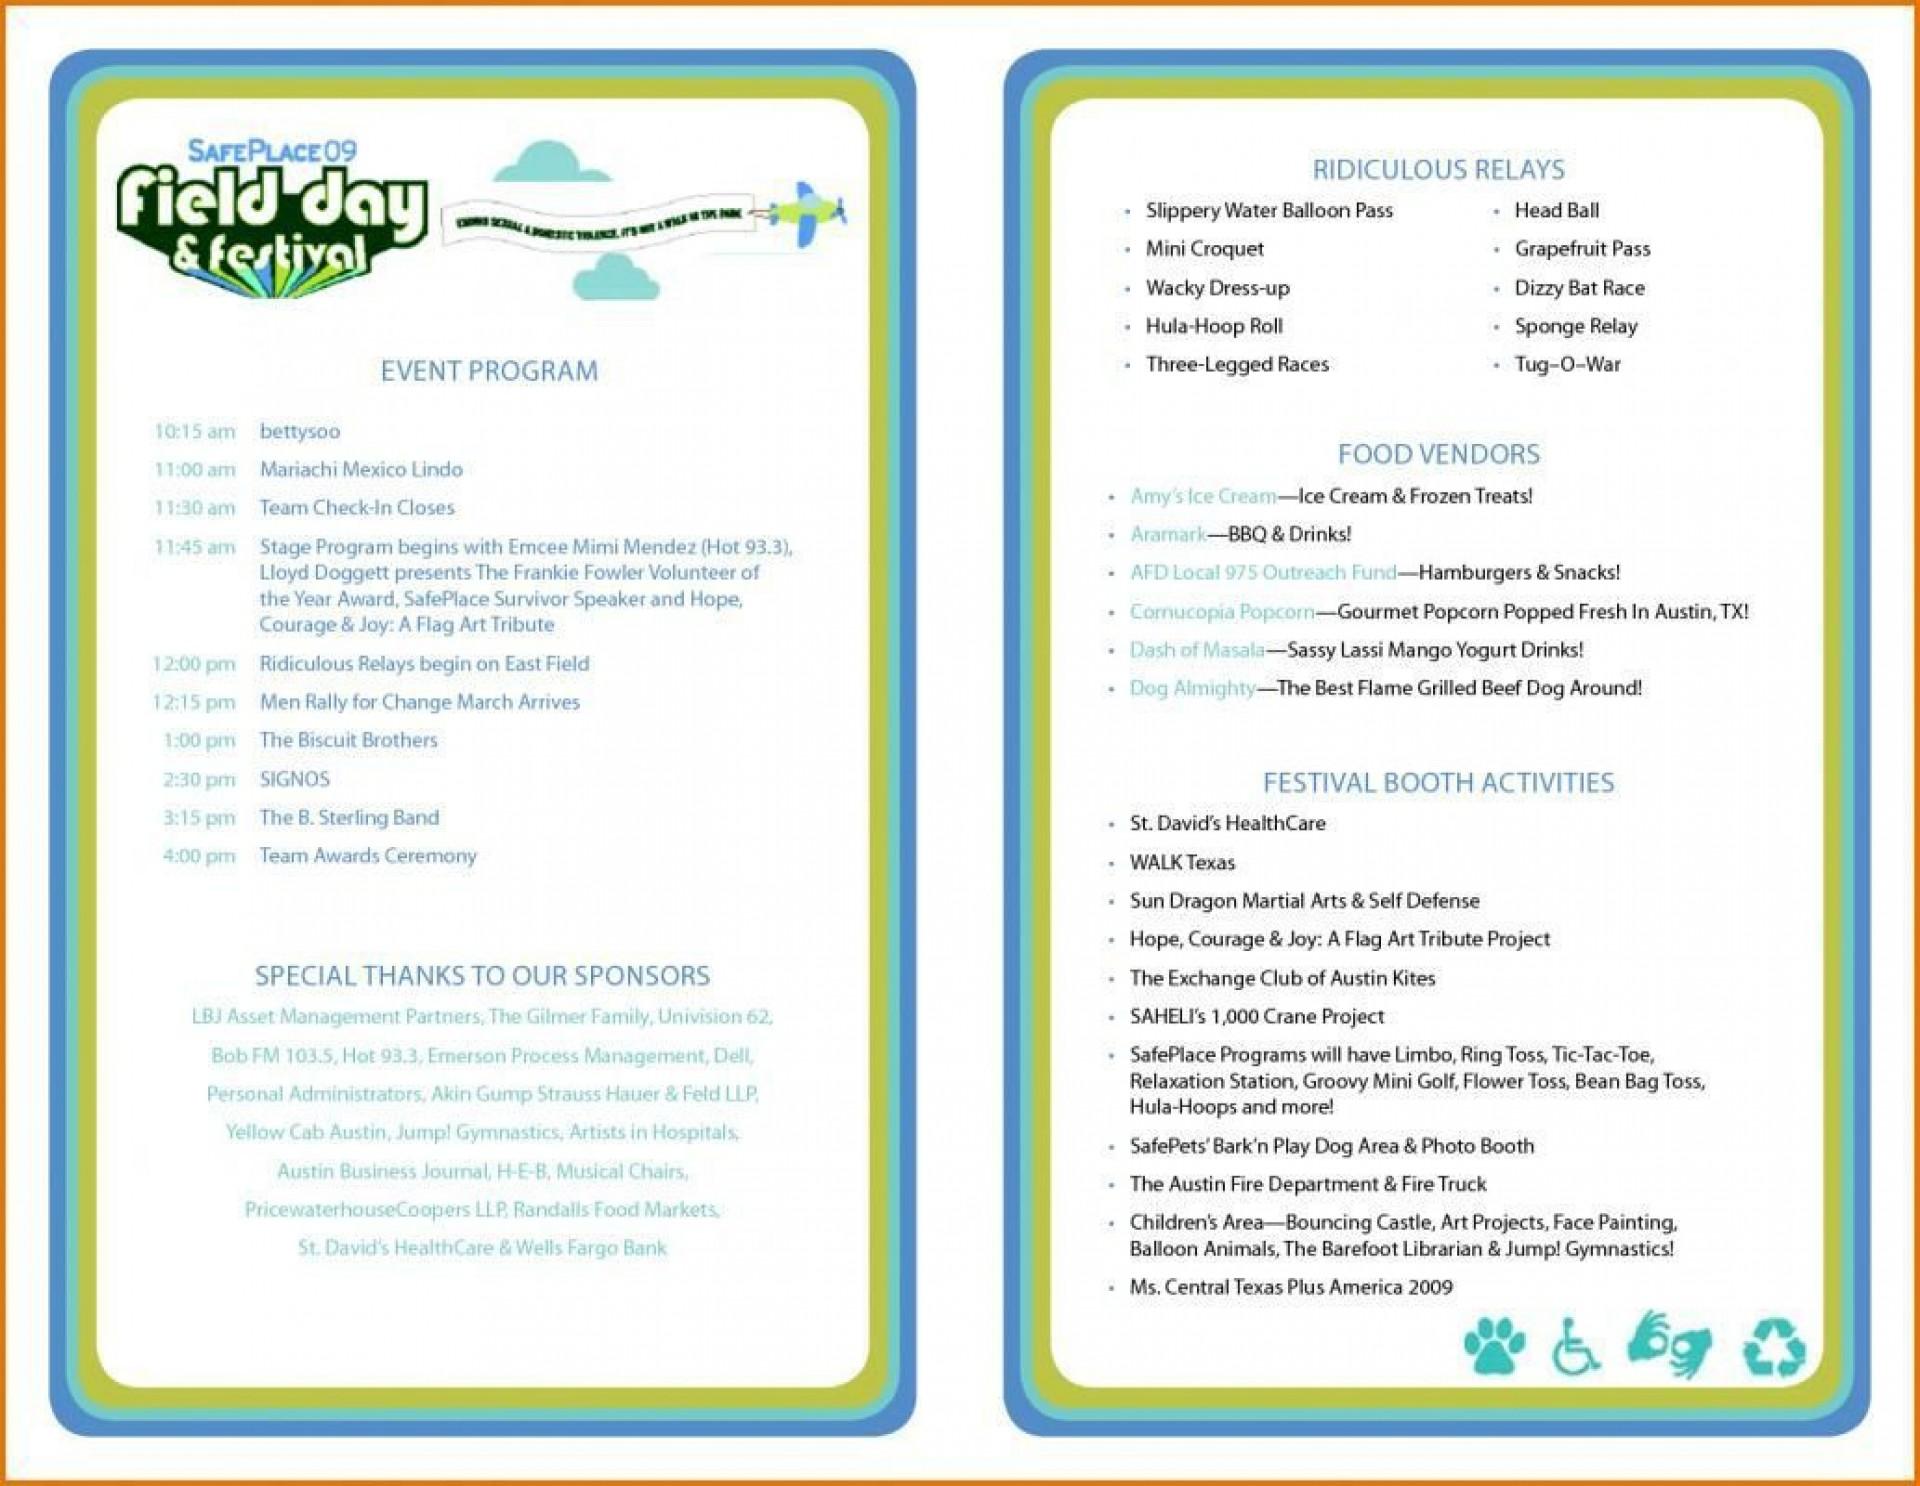 001 Marvelou Free Event Program Template Image  Templates Half Fold Online Download1920